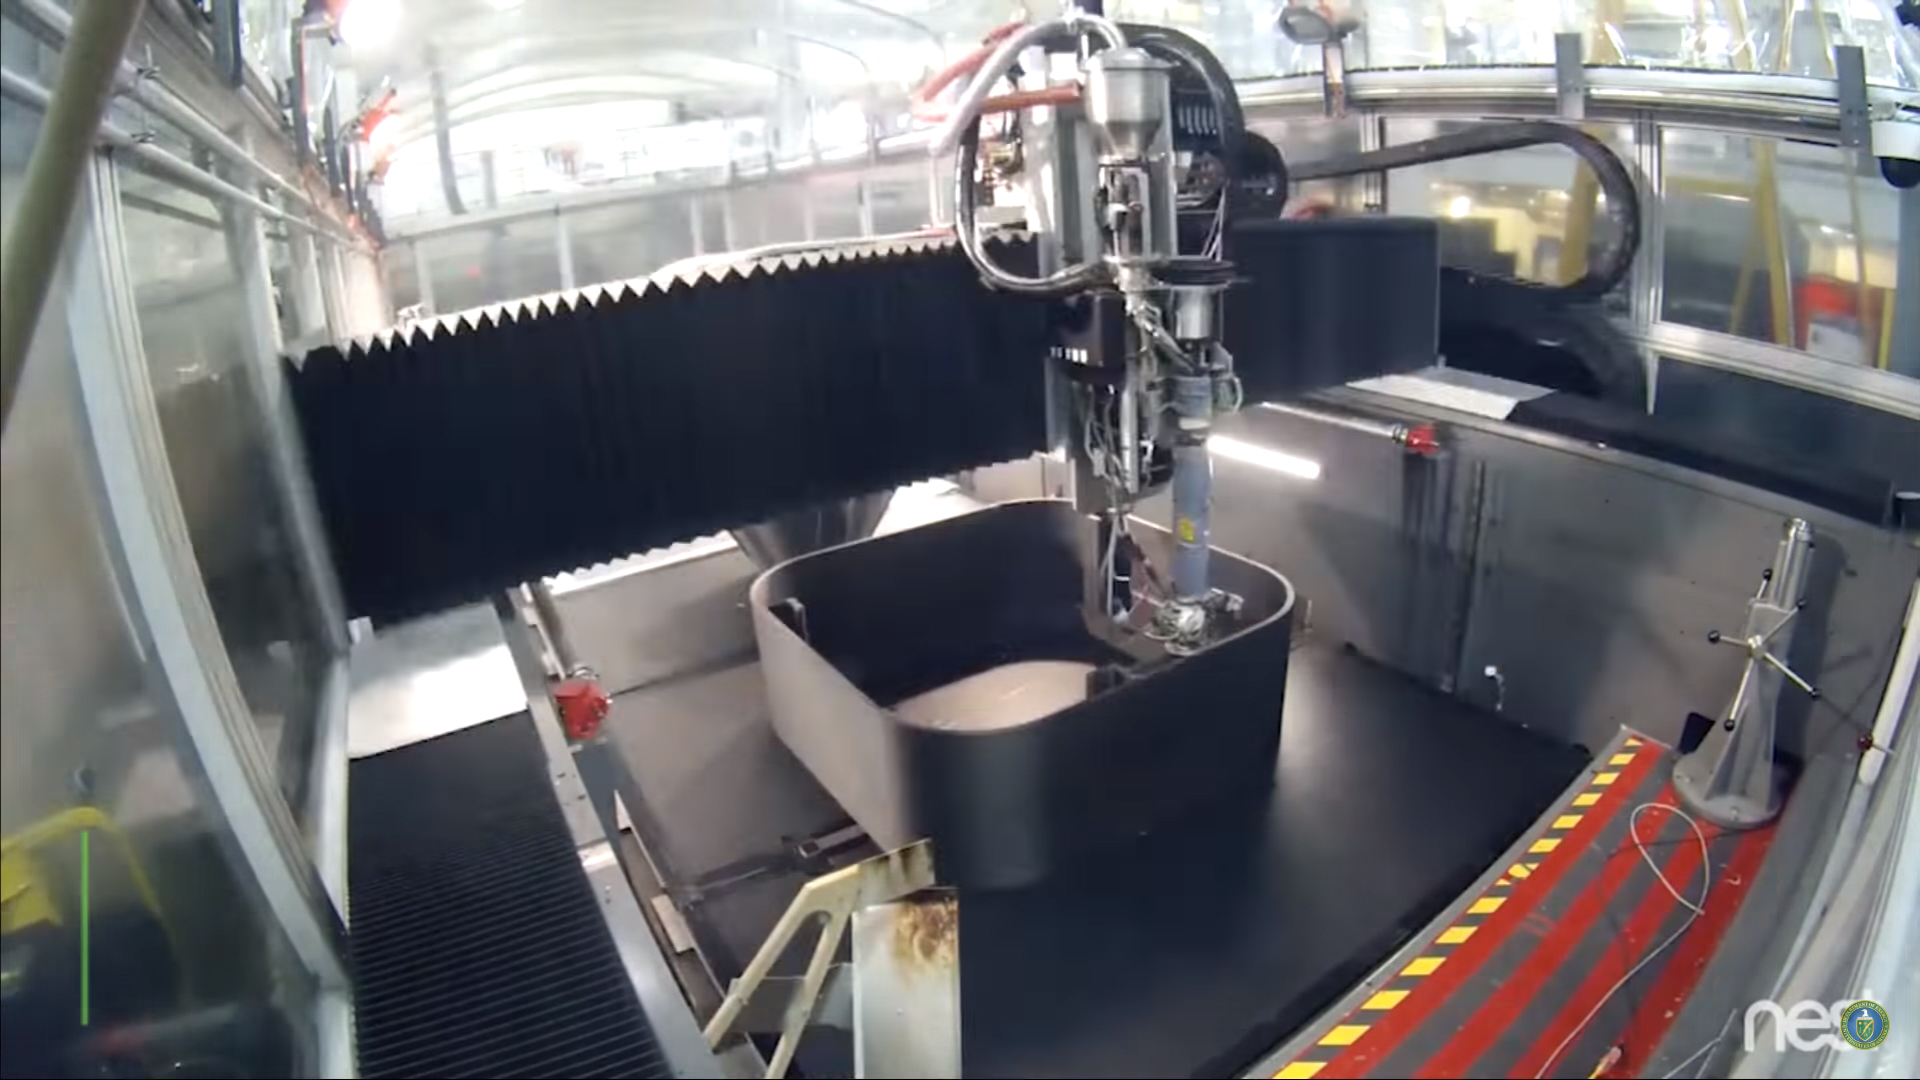 3d gedrucktes uboot 3 - Navy'sDisruptive Technology Lab realisiert 3D-gedrucktes U-Boot mit BAAM 3D-Drucker